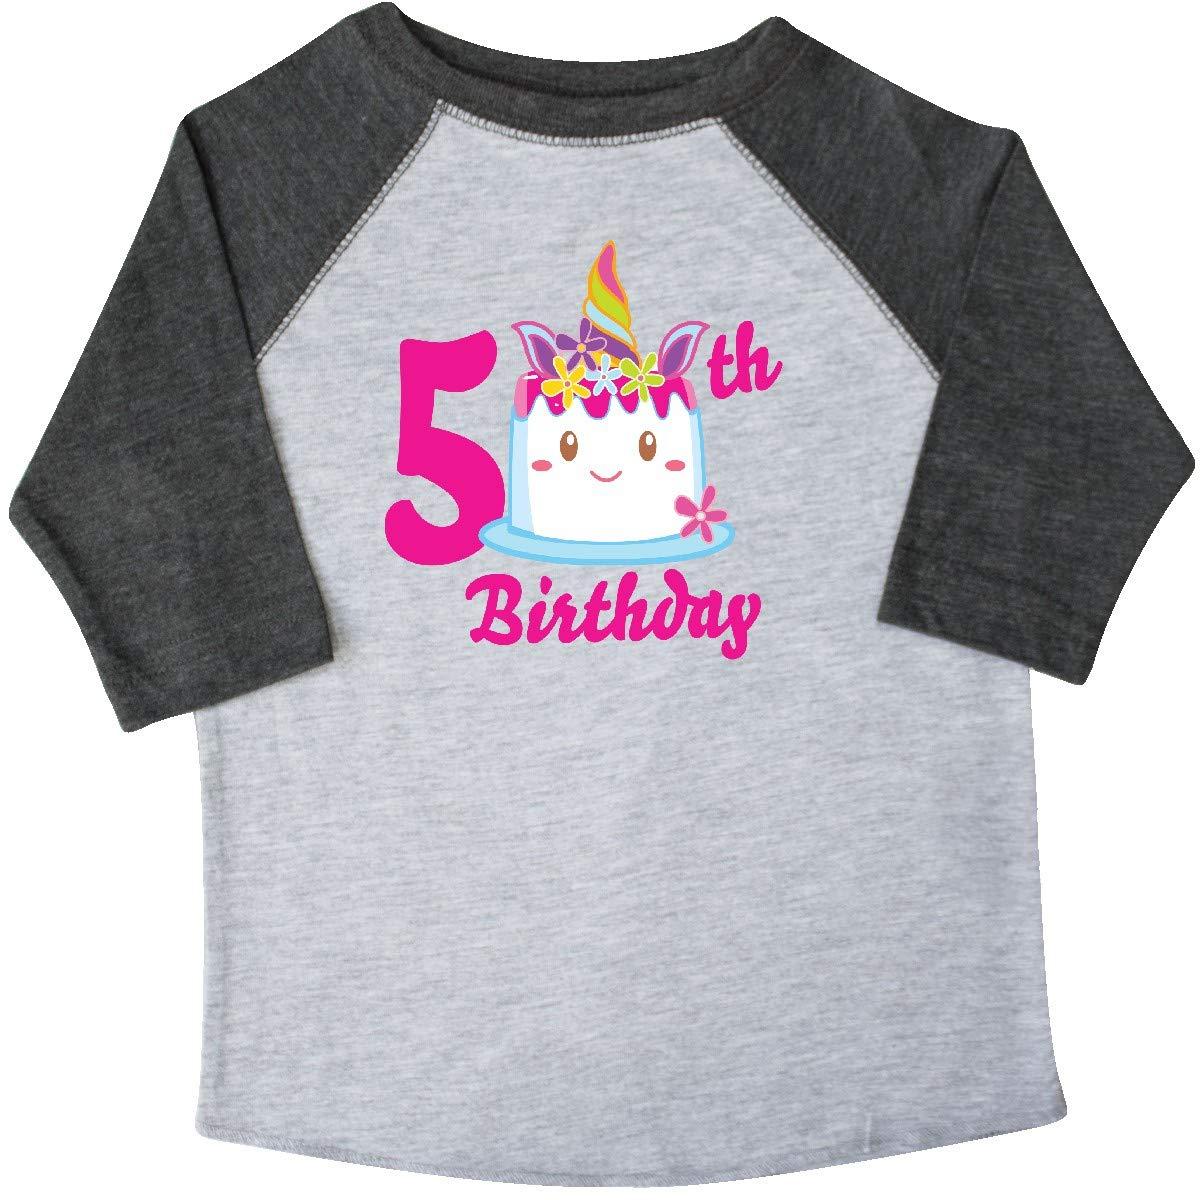 inktastic 5th Birthday with Unicorn Cake Toddler T-Shirt